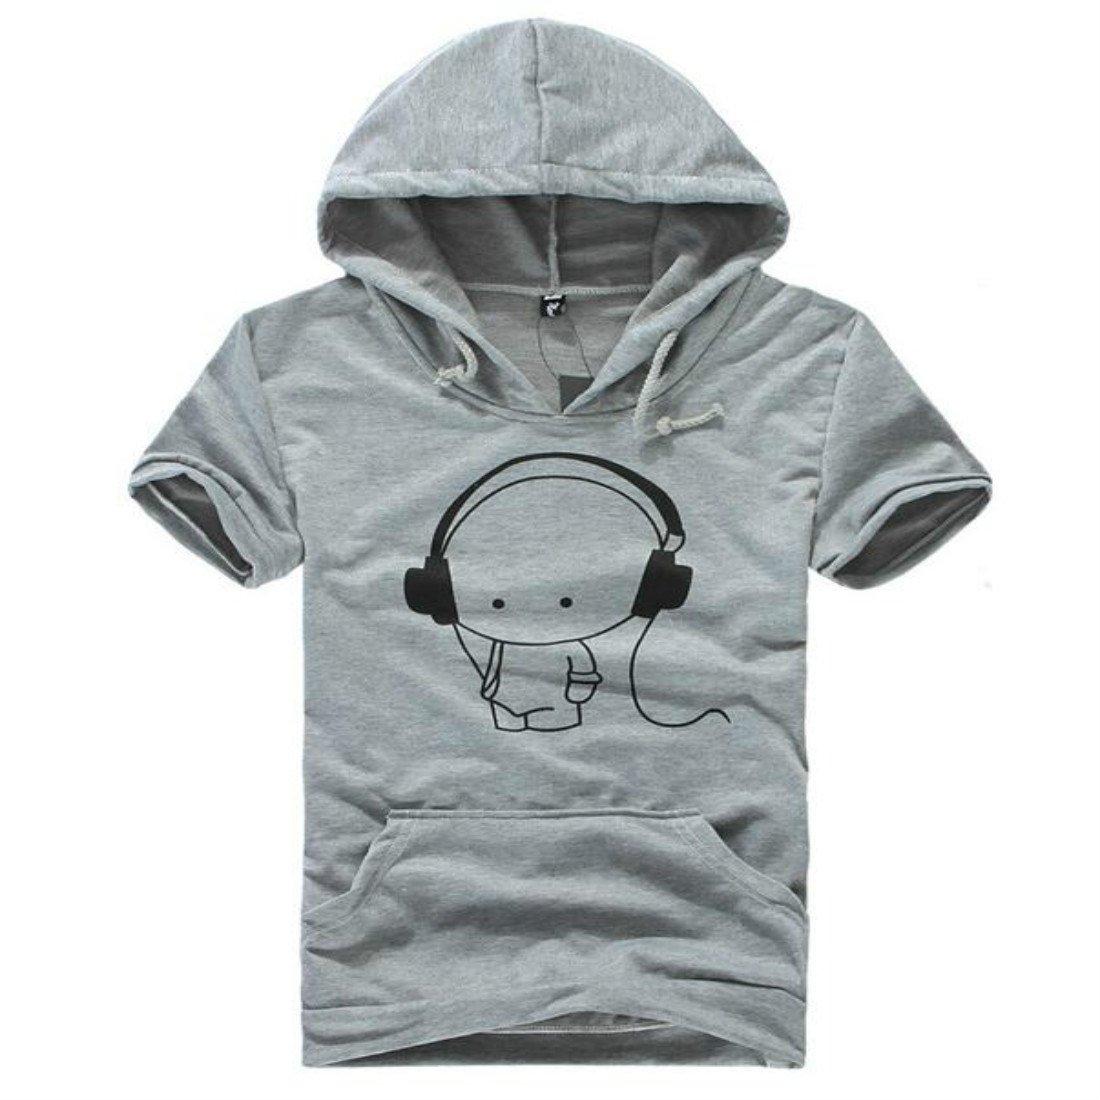 Colygamala Mens Summer Headphones Music Printed Tees Hoodie T-Shirt Black//Grey//White